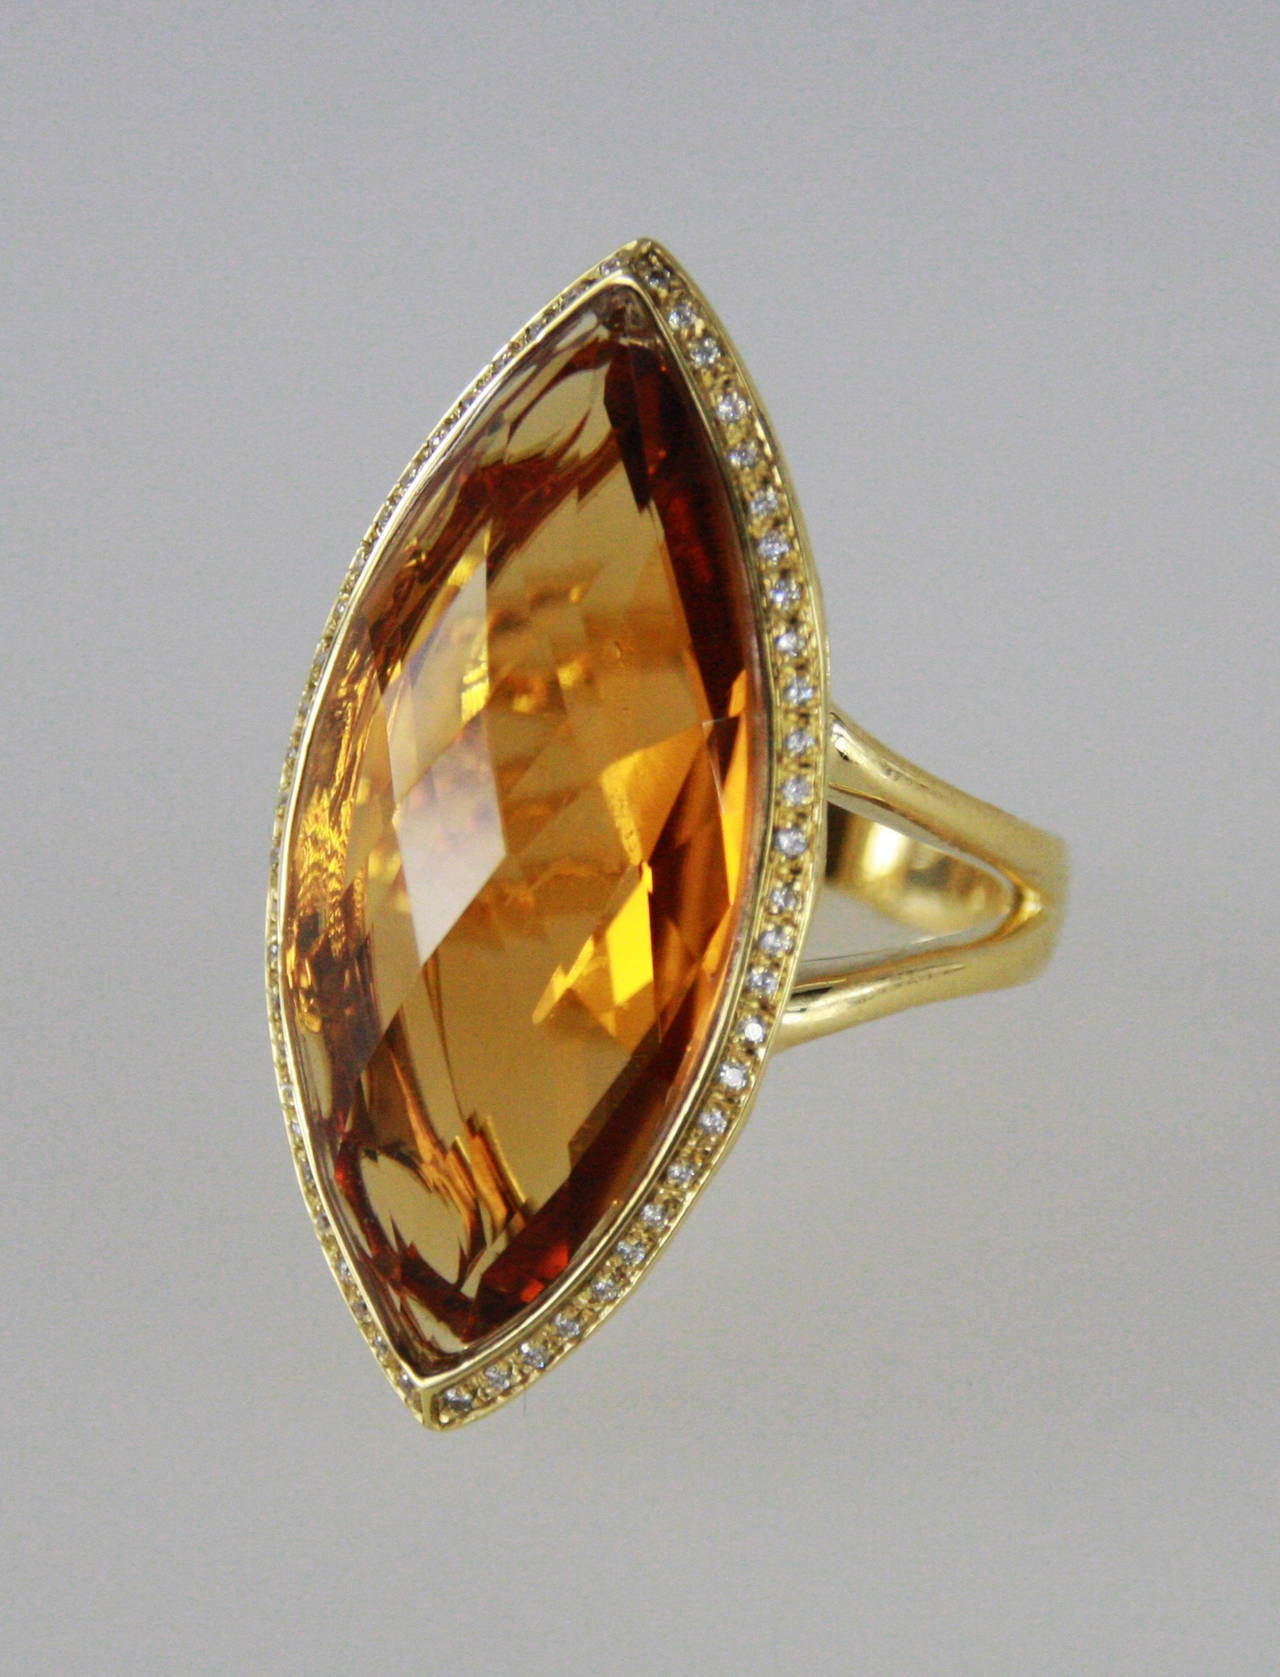 Italian Citrine Diamond Gold Ring For Sale At 1stdibs. 100% Rings. Teardrop Wedding Rings. Floral Cut Engagement Rings. Tiffany Big Diamond Wedding Rings. Charmed Engagement Rings. Dome Rings. Mordor Rings. Third Eye Rings